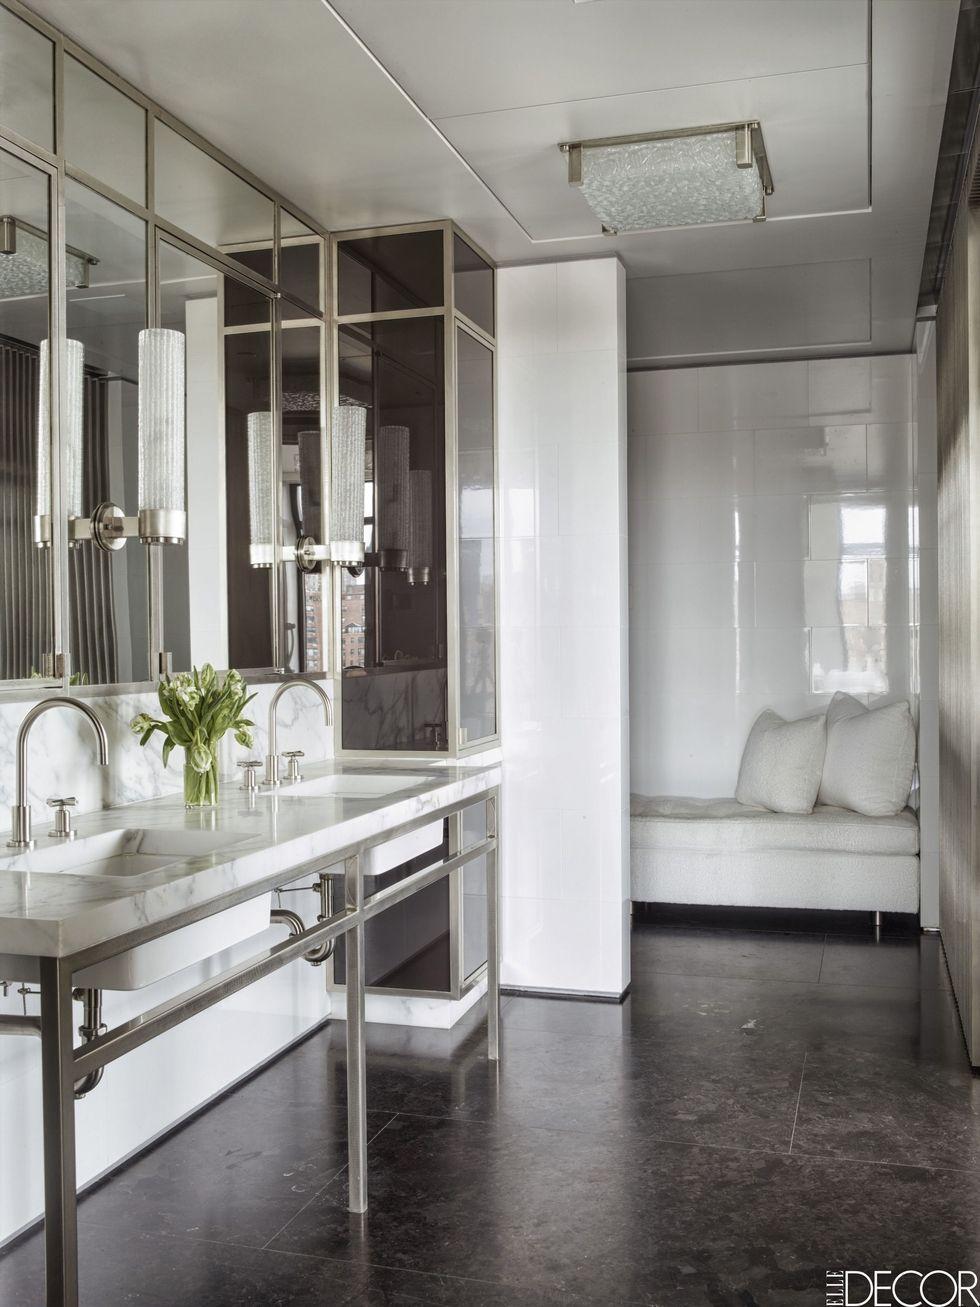 25 White Bathroom Design Ideas - Decorating Tips for All ... on White Bathroom Design Ideas  id=79340